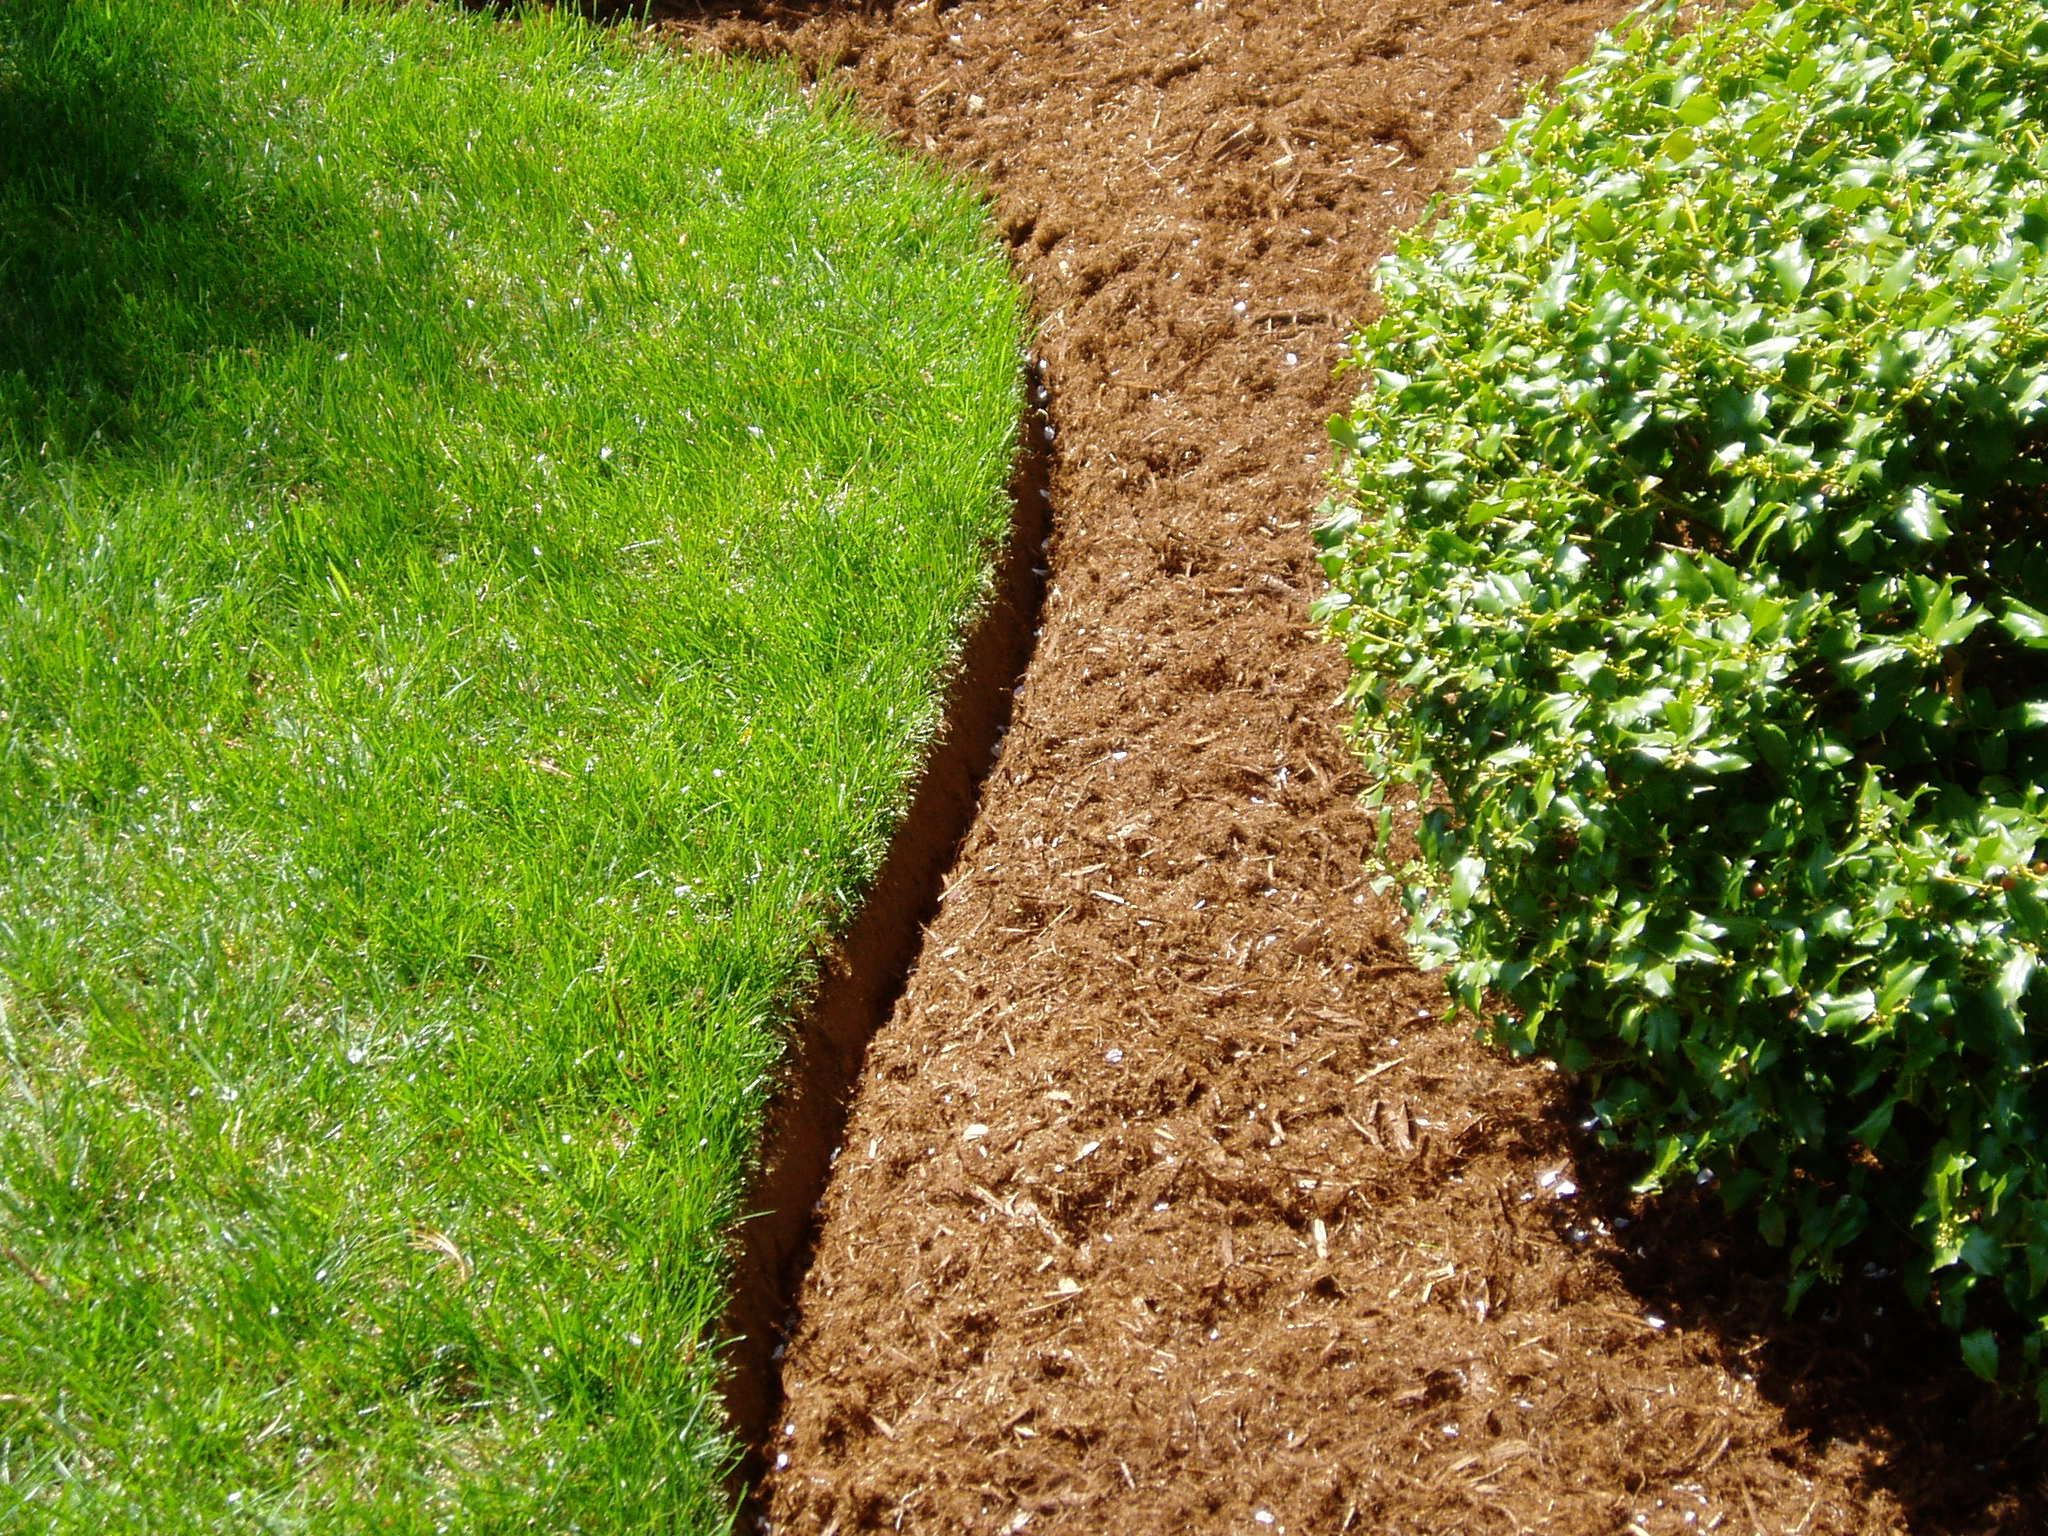 Professional Landscaping Services Landscape Solutions Landscape Edging Landscape Solutions Landscape Services